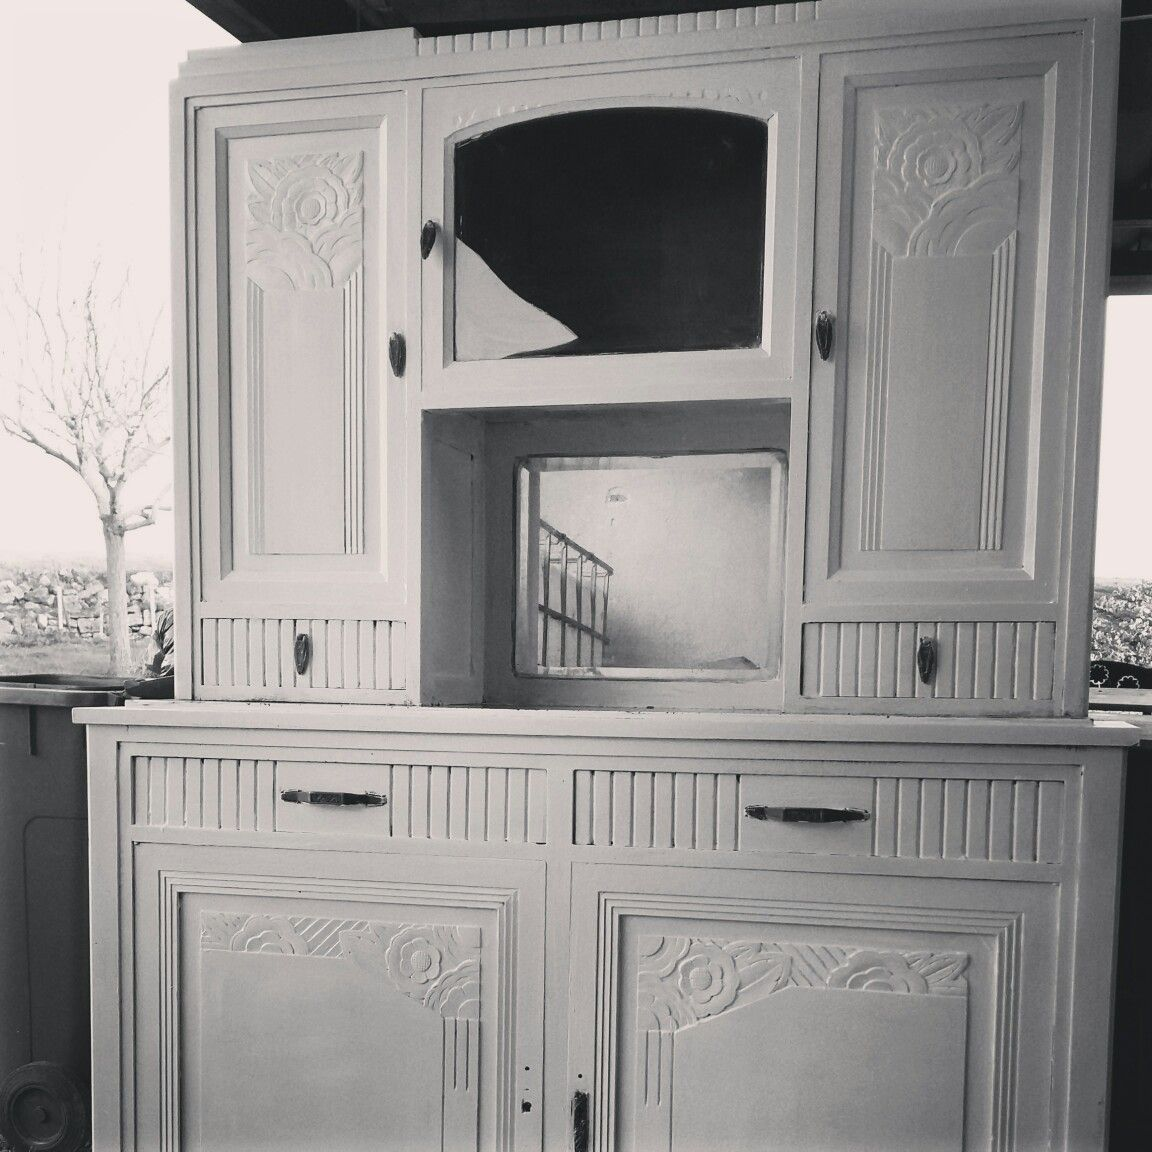 buffet des ann es 30 relook brikbroc marennes pinterest marennes les ann es 30 et ann es 30. Black Bedroom Furniture Sets. Home Design Ideas